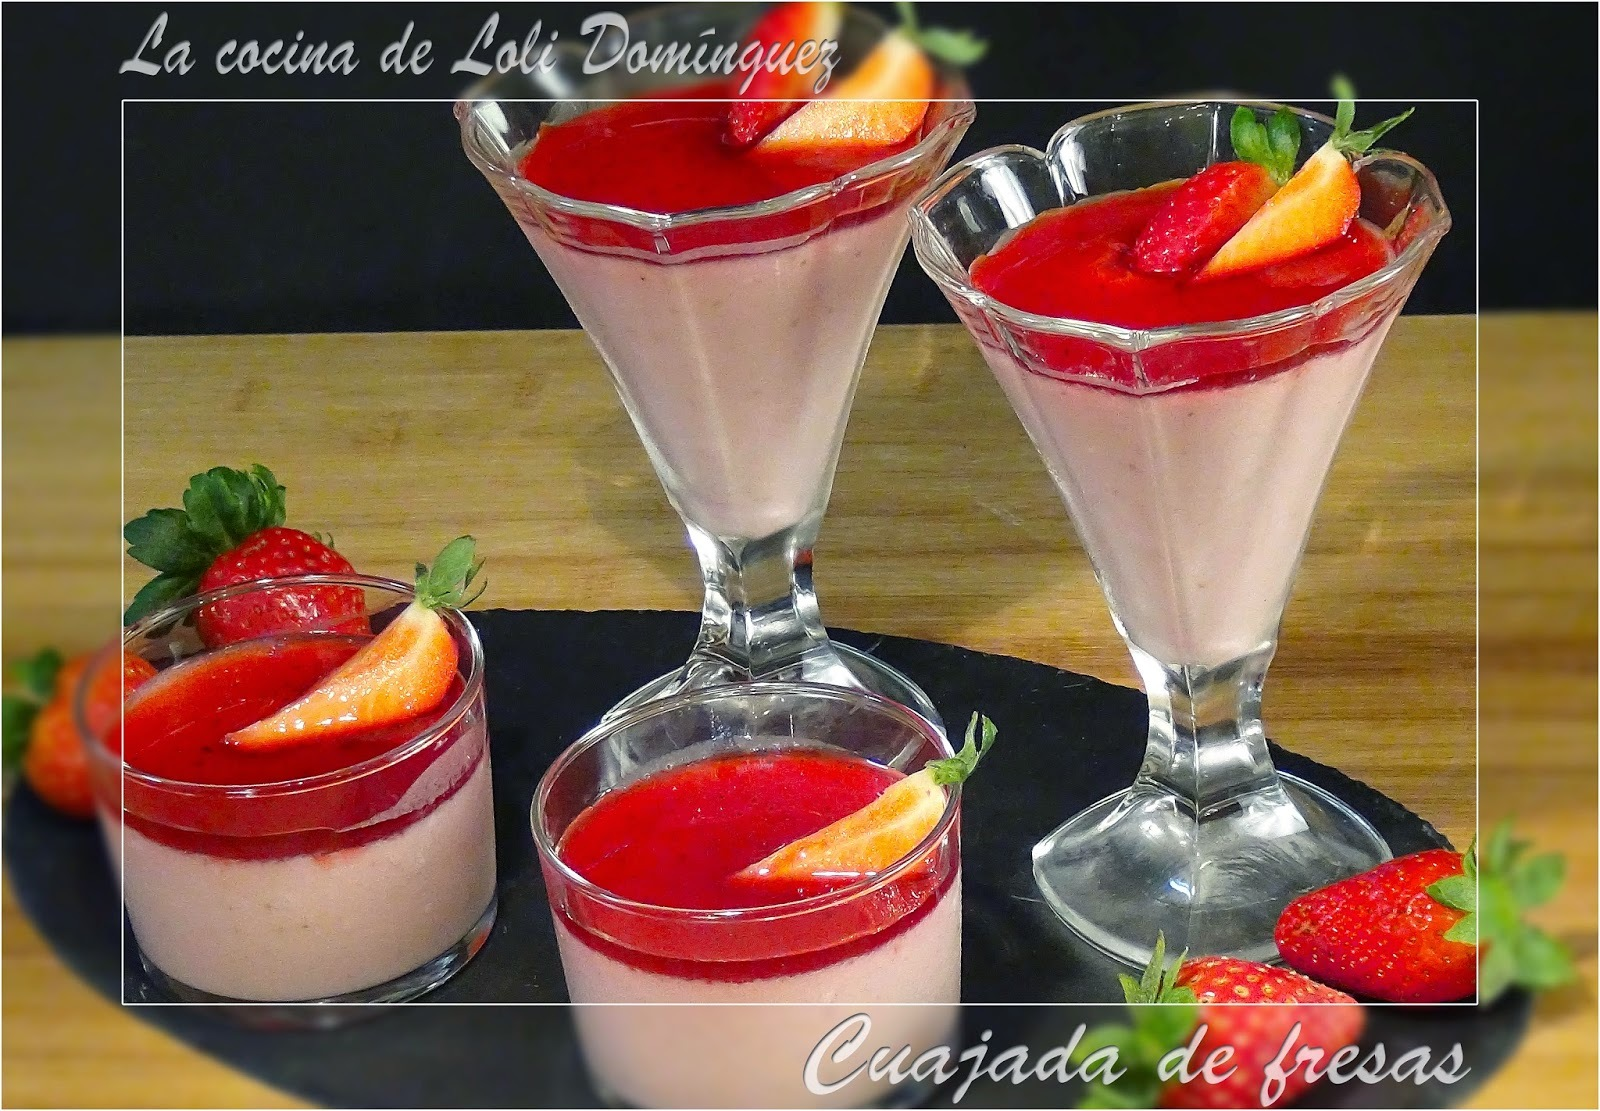 Cuajada de fresas